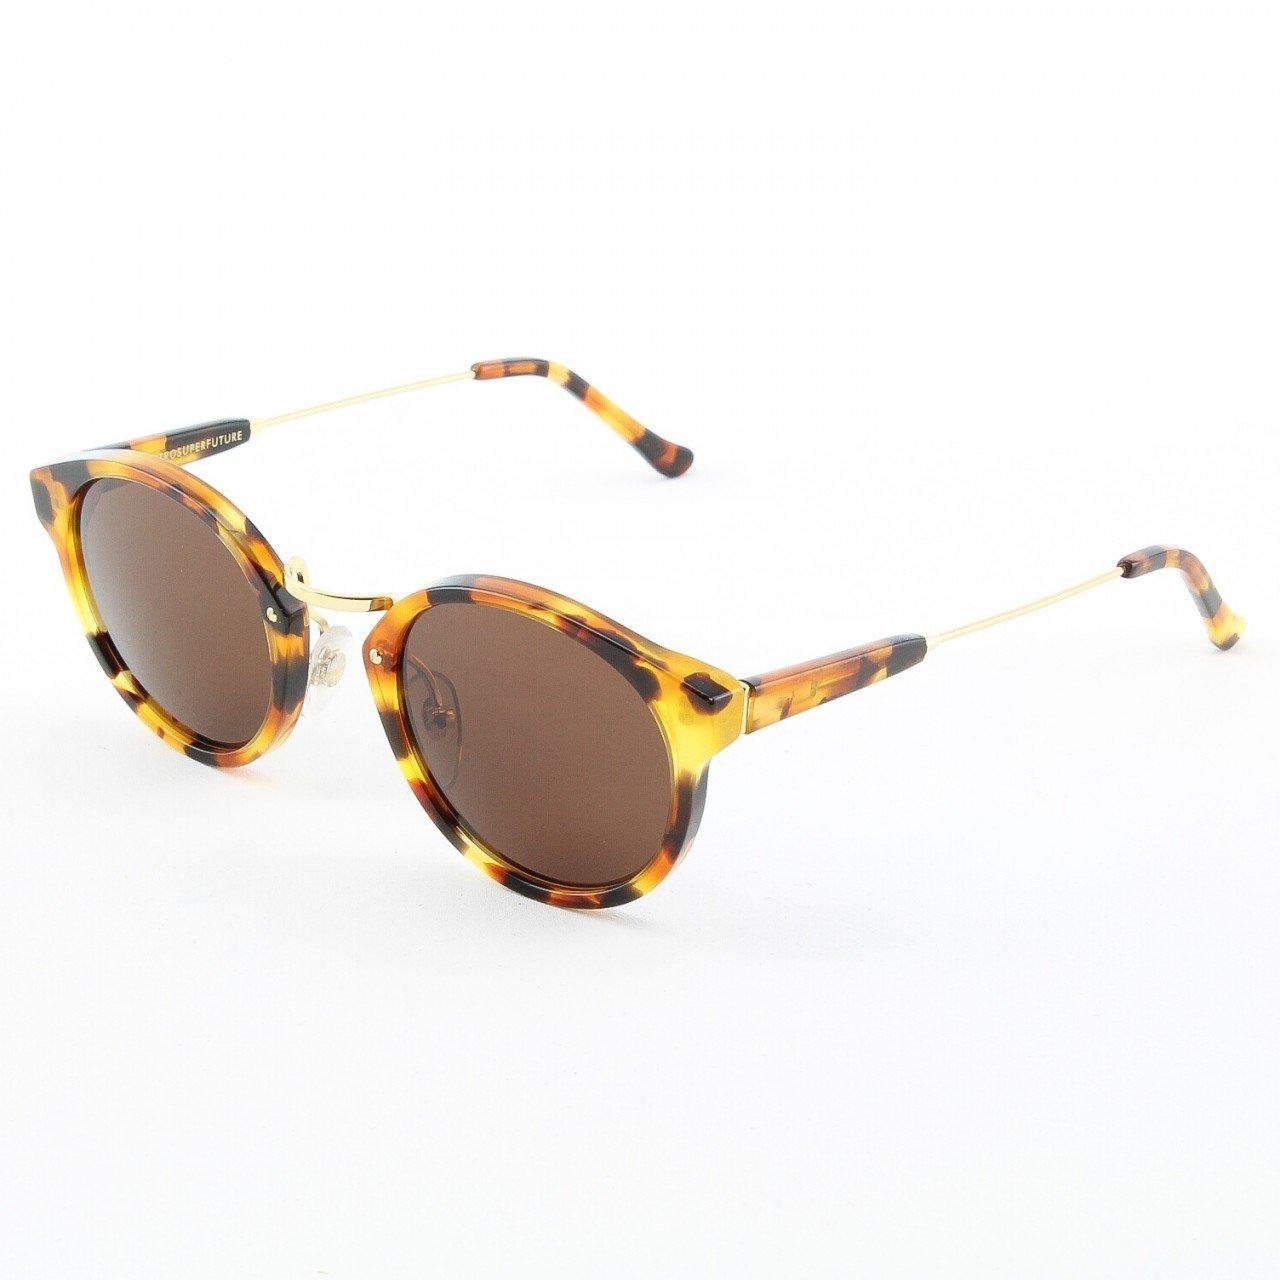 Super Panama 476/3T Sunglasses by RETROSUPERFUTURE Color Dark Havana with Brown Zeiss Lenses